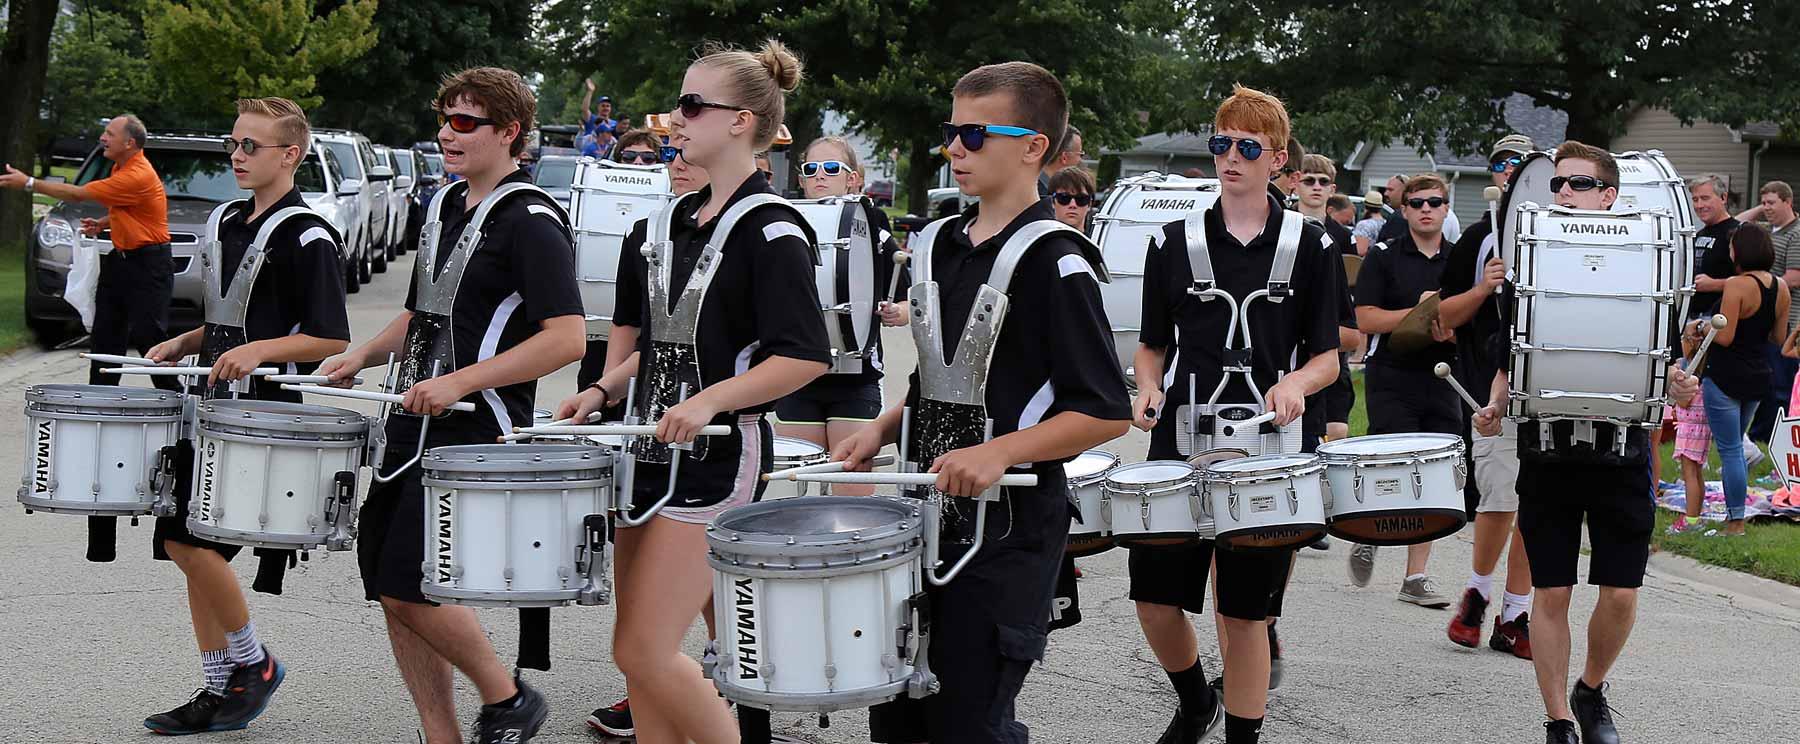 Sugar Grove Corn Boil Festival Parade & Opening Ceremony